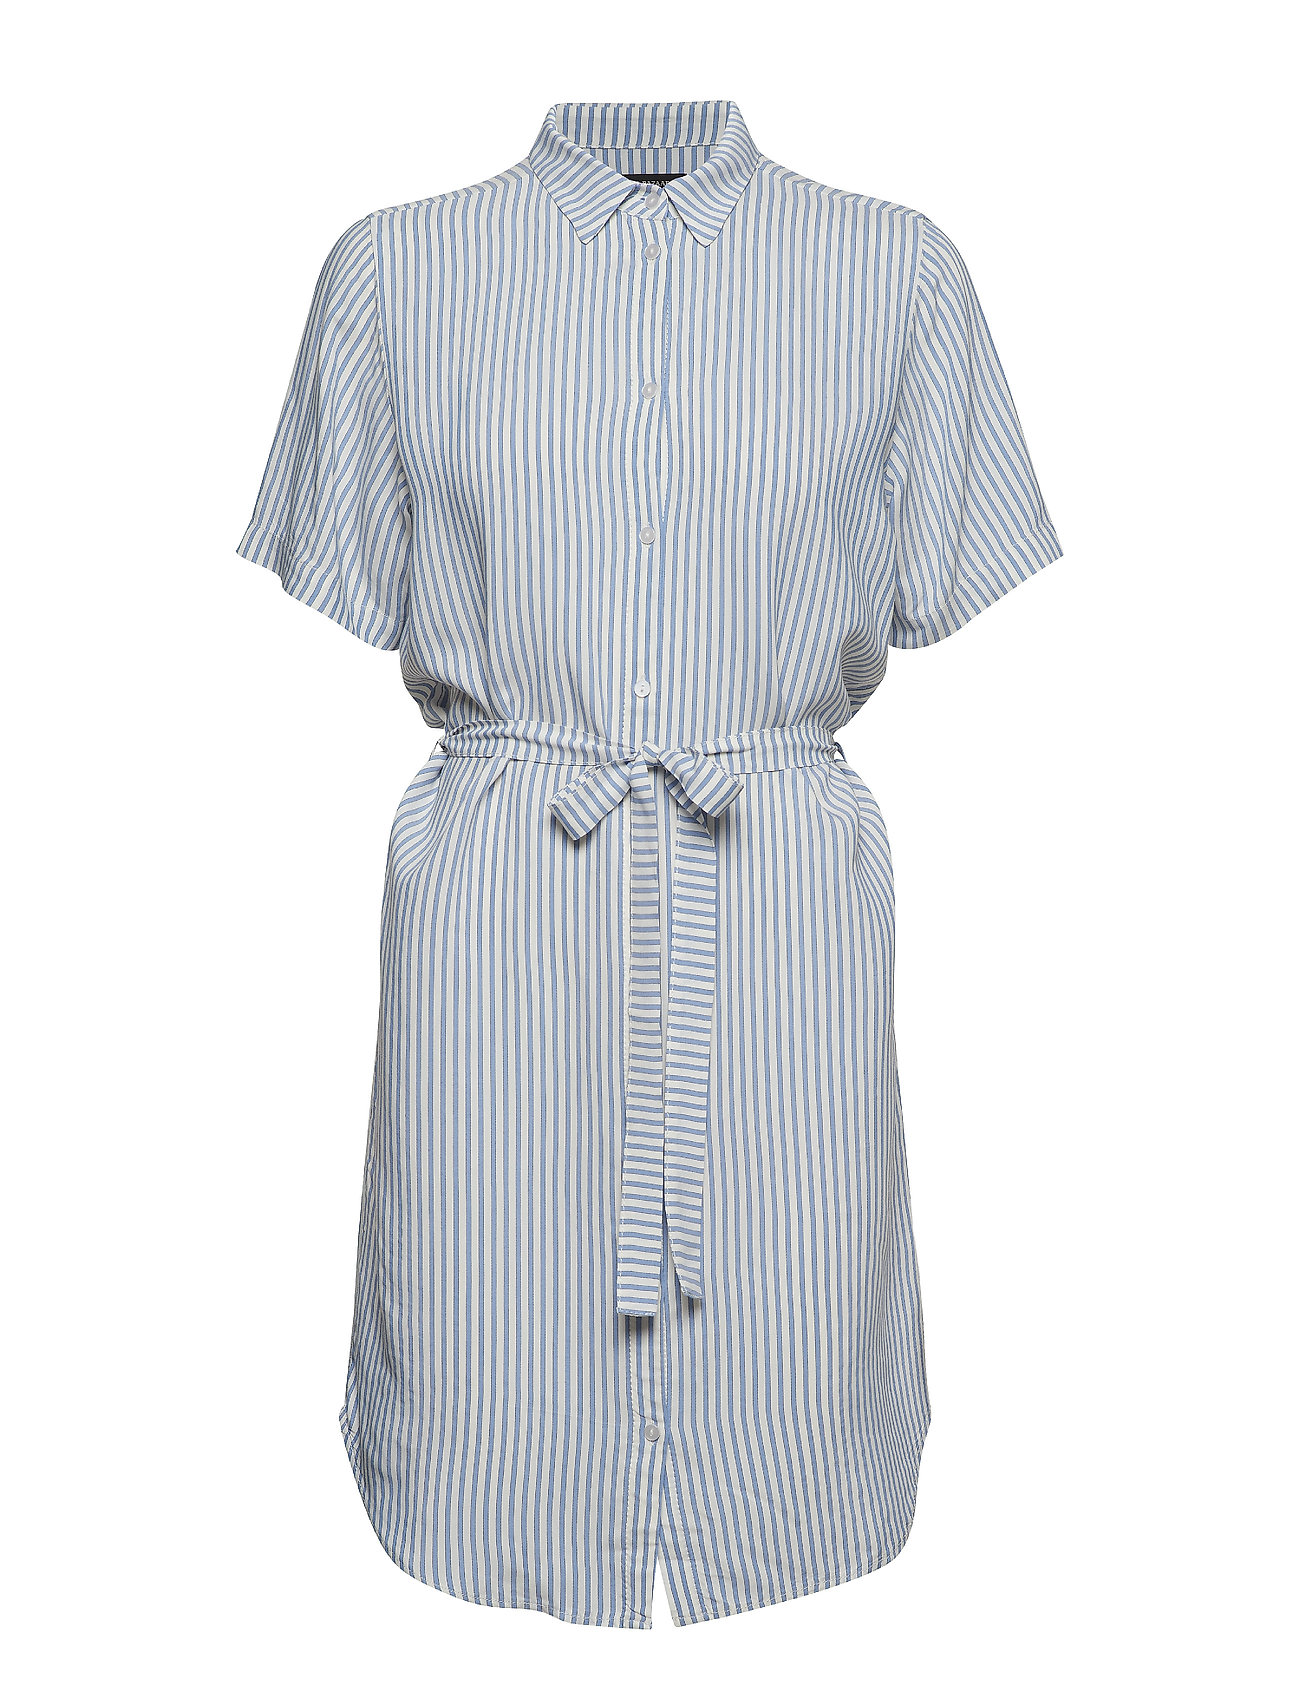 Bruuns Bazaar Bertha Nella Shirt Dress - SNOW WHITE WITH BLUE STRIPES